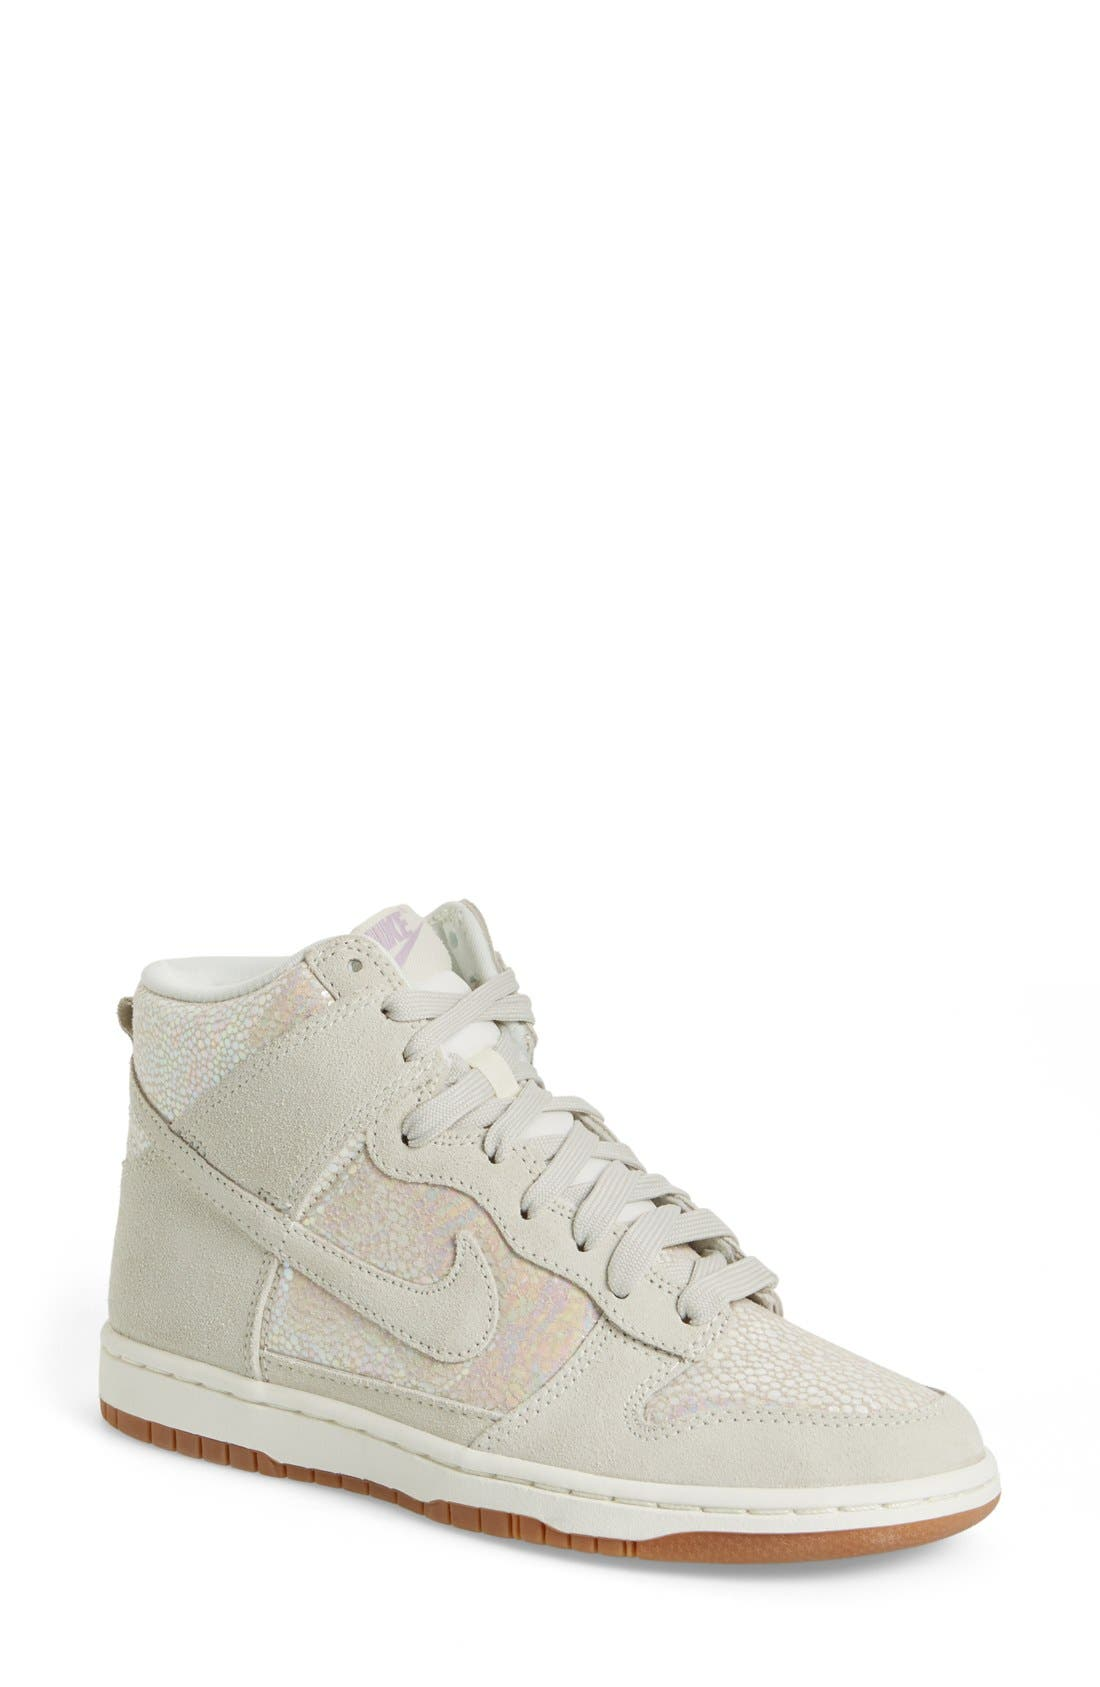 Alternate Image 1 Selected - Nike 'Dunk High' Sneaker (Women)